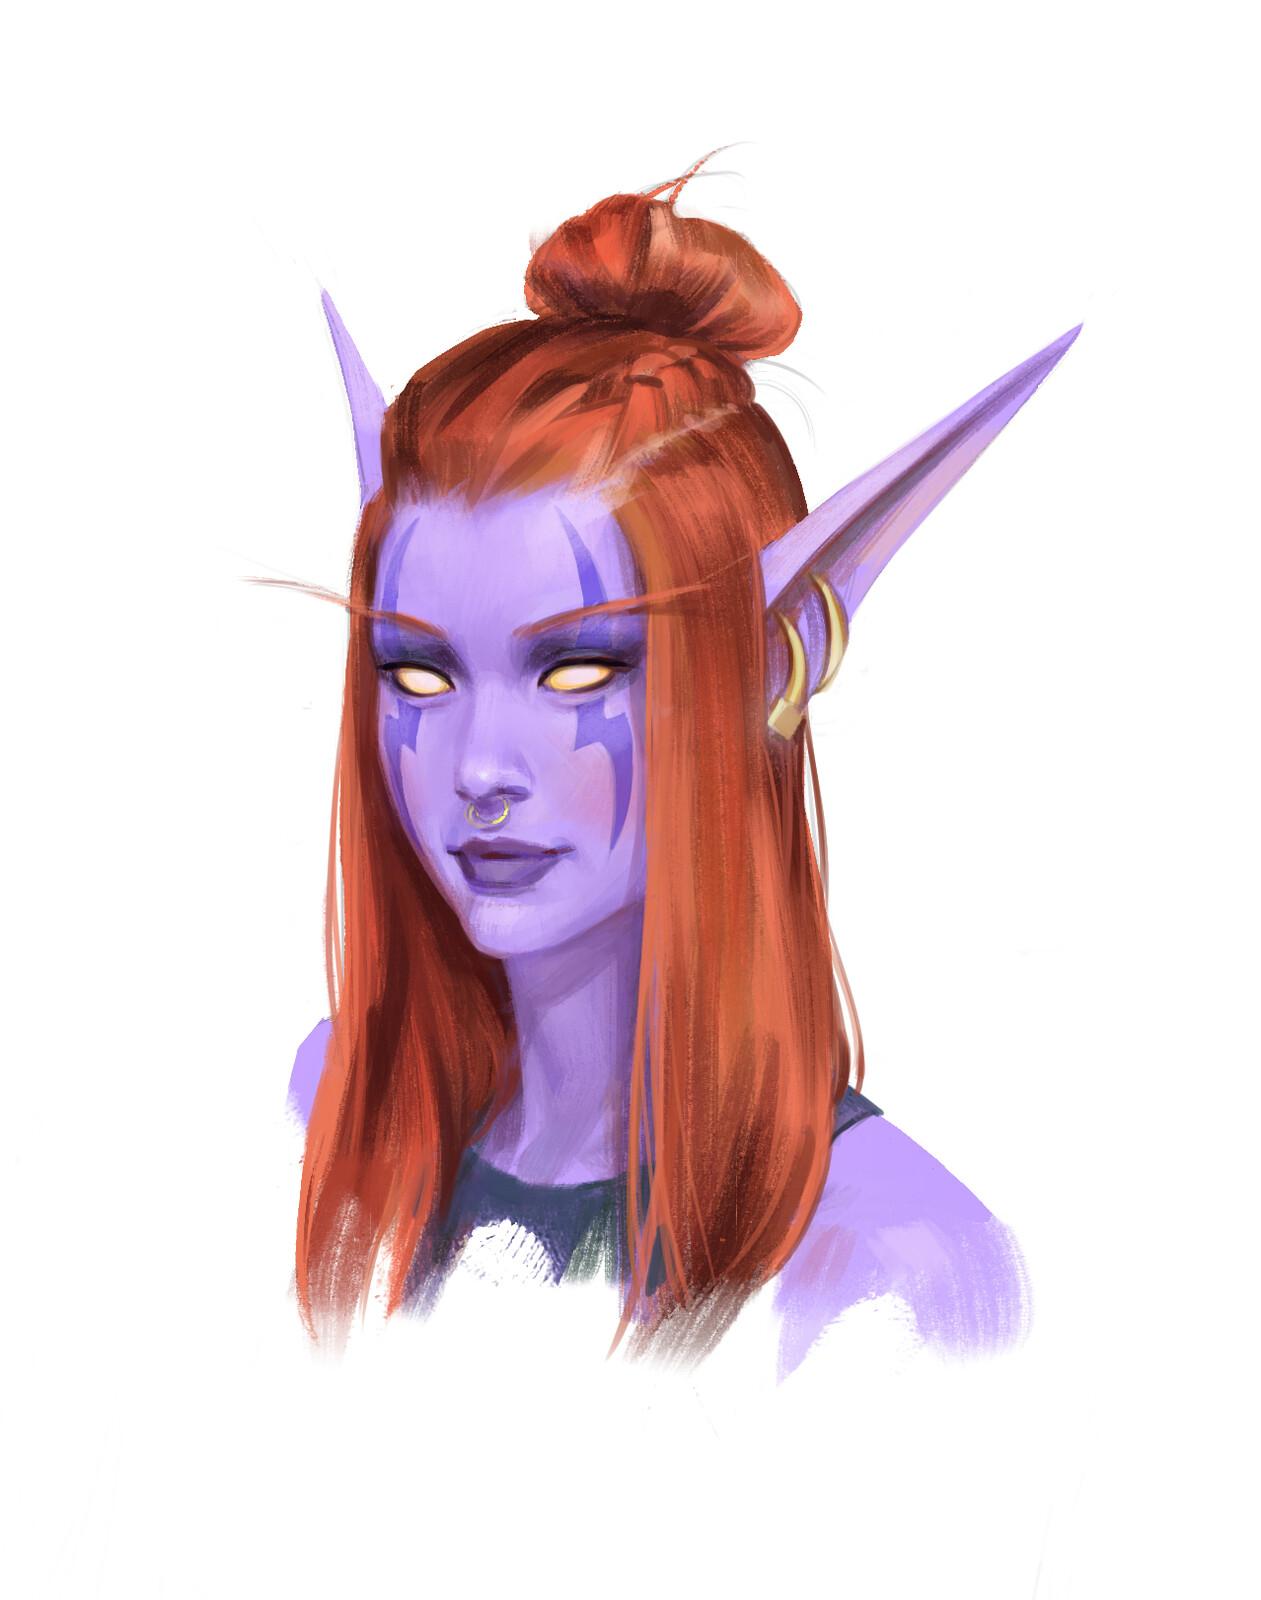 Miaow the Night Elf Druid (WoW)